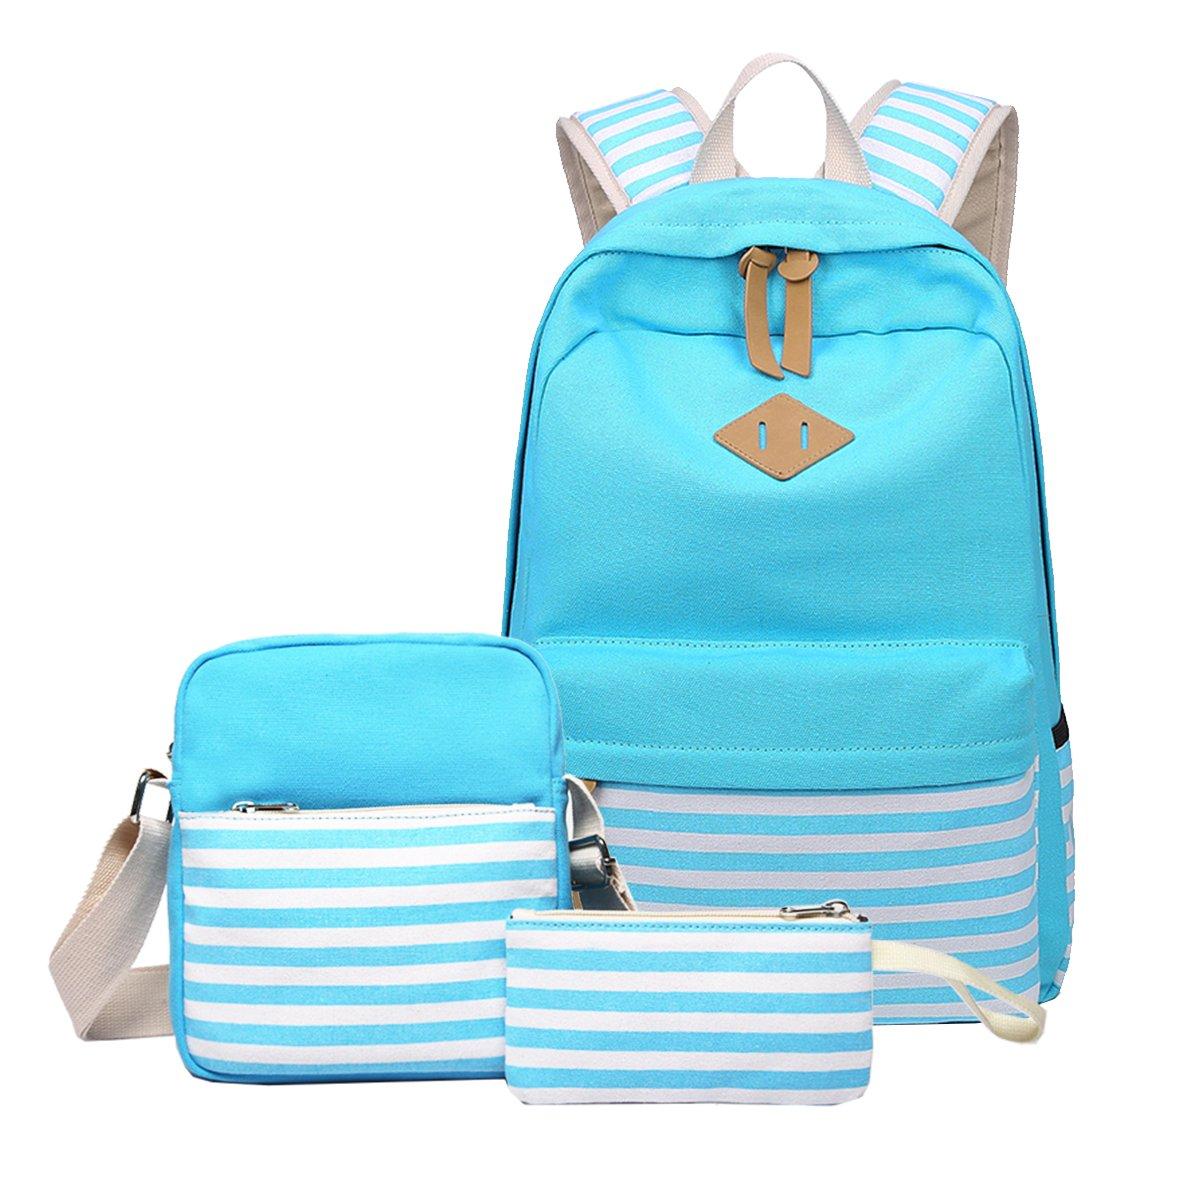 Canvas School Backpacks,Colorful Girls'3 Set Backpacks,Fashion Backpack Colorful shopping Bags Travel Pack for Backpack Laptop Shoulder Bag Pencil Case(LightBlue)Boens